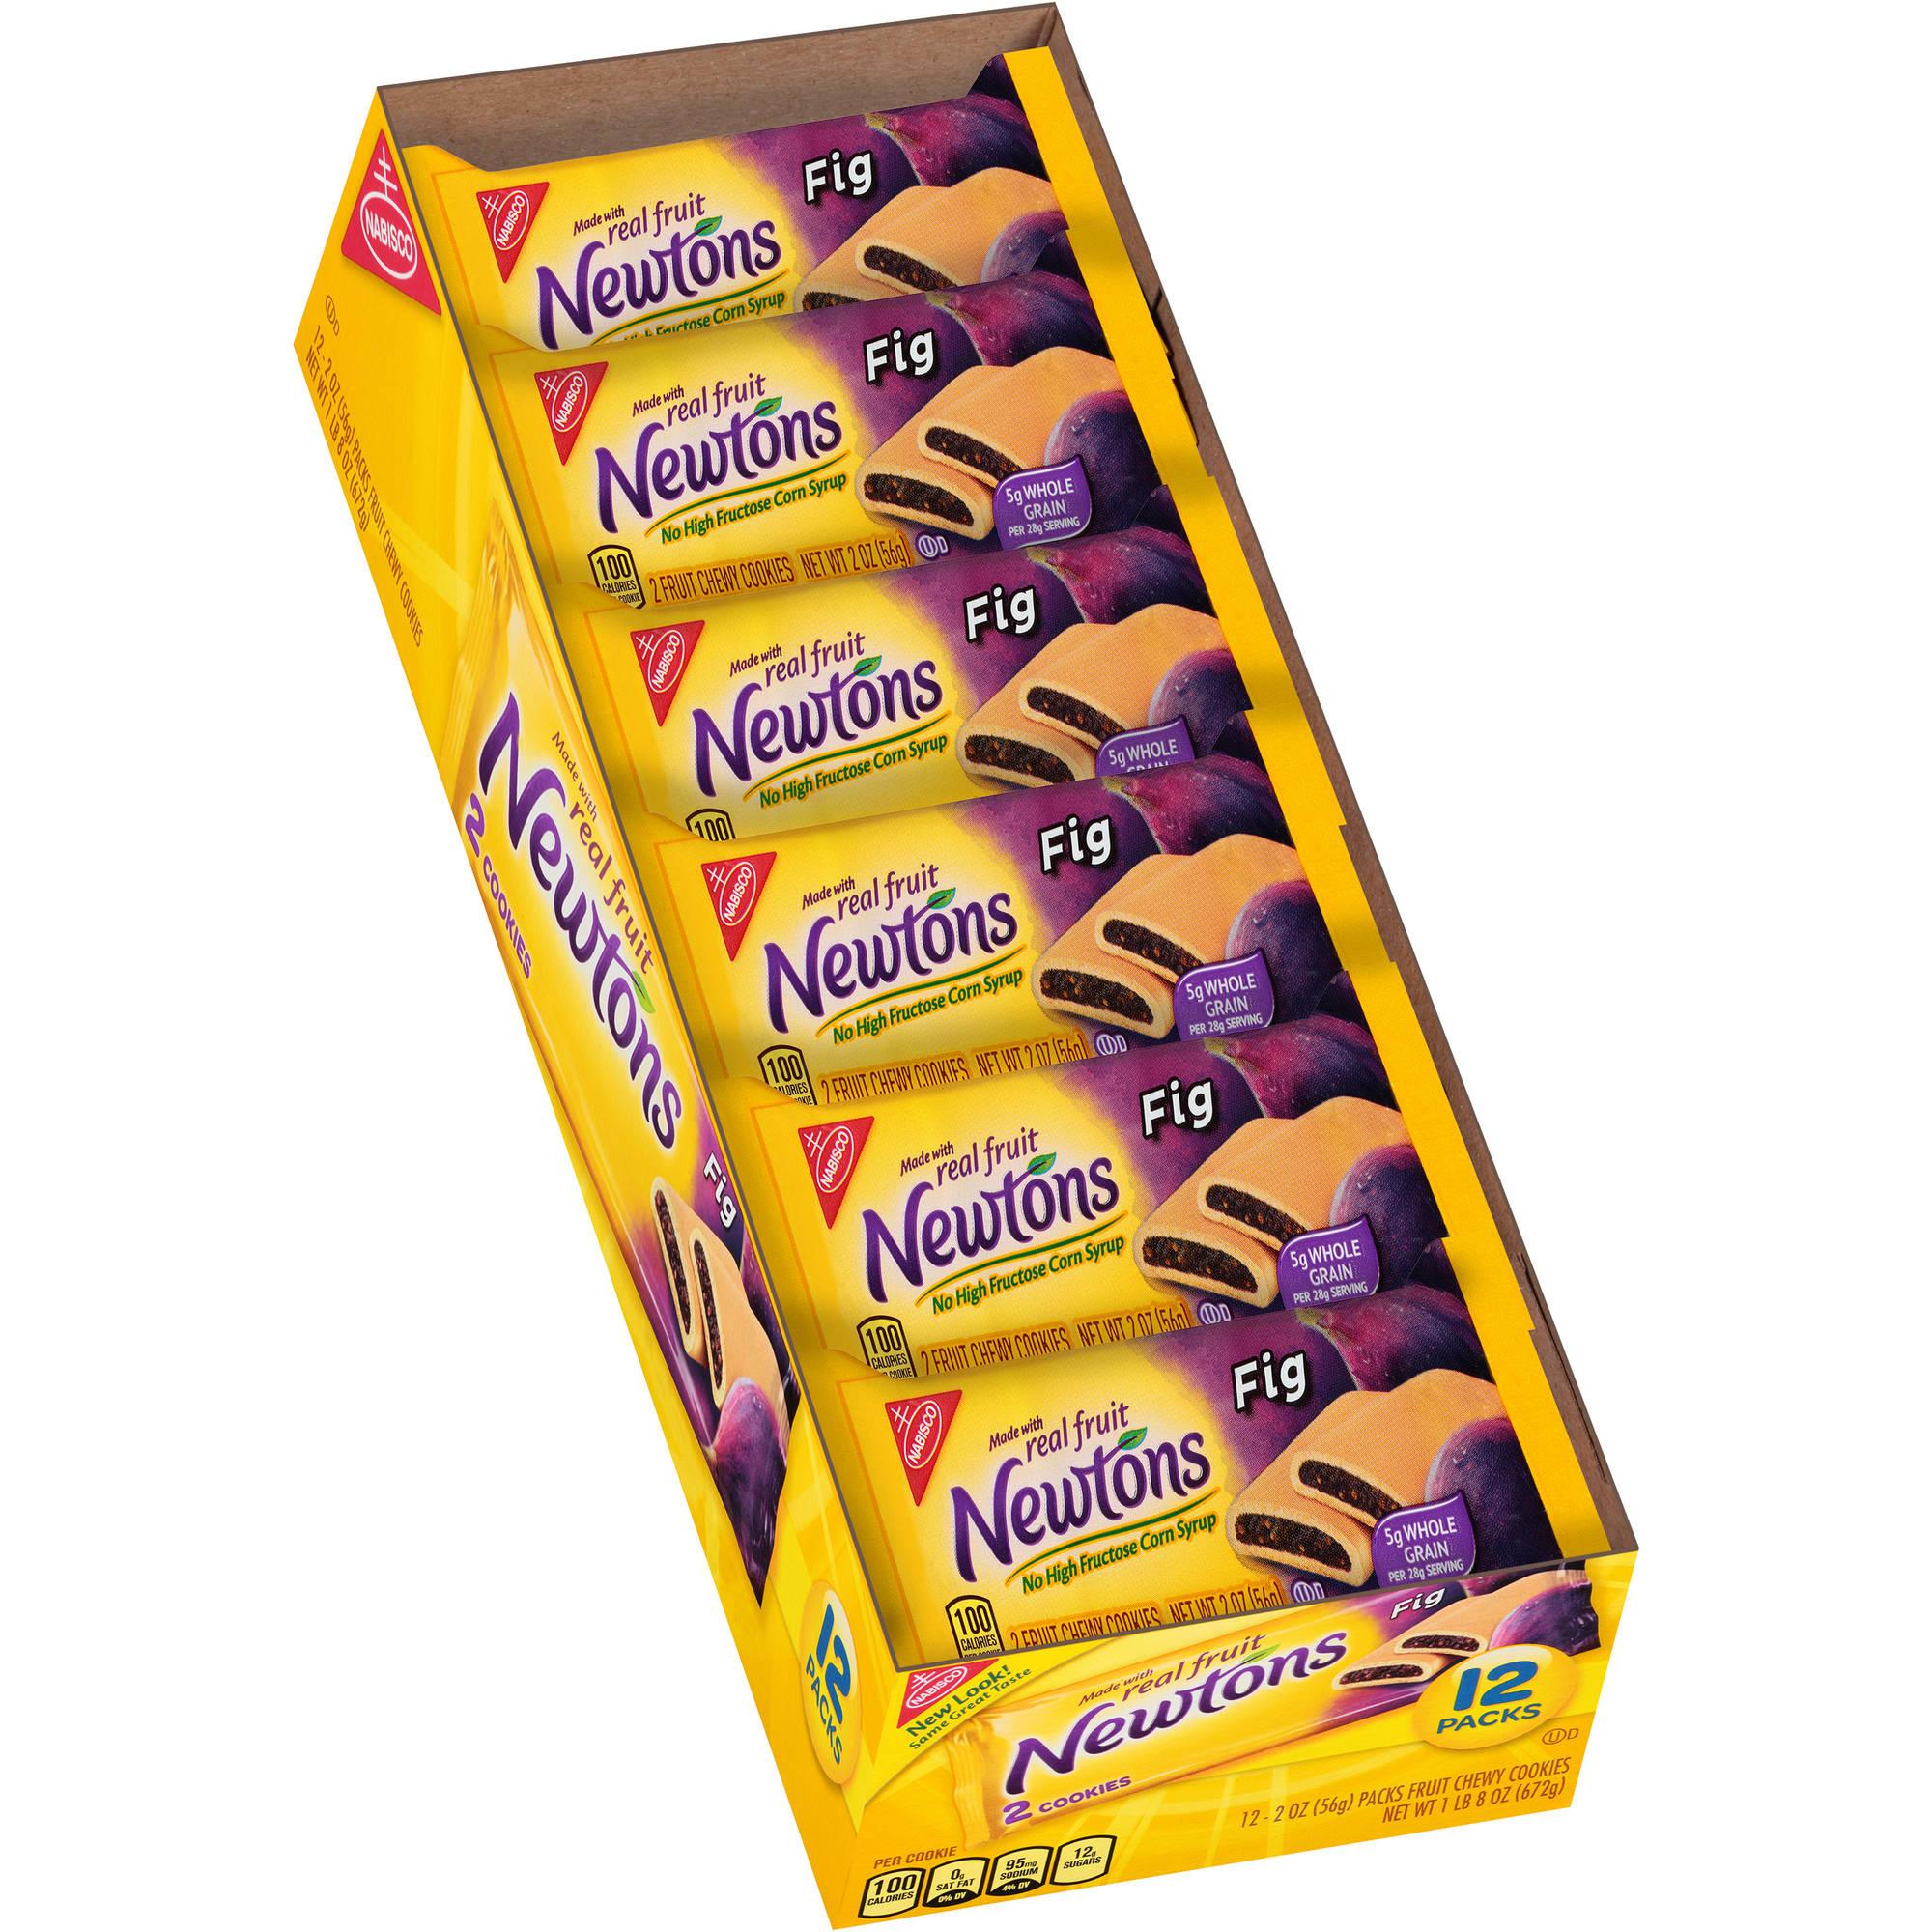 Nabisco Newtons Fig Cookies, 2 oz, 12 count